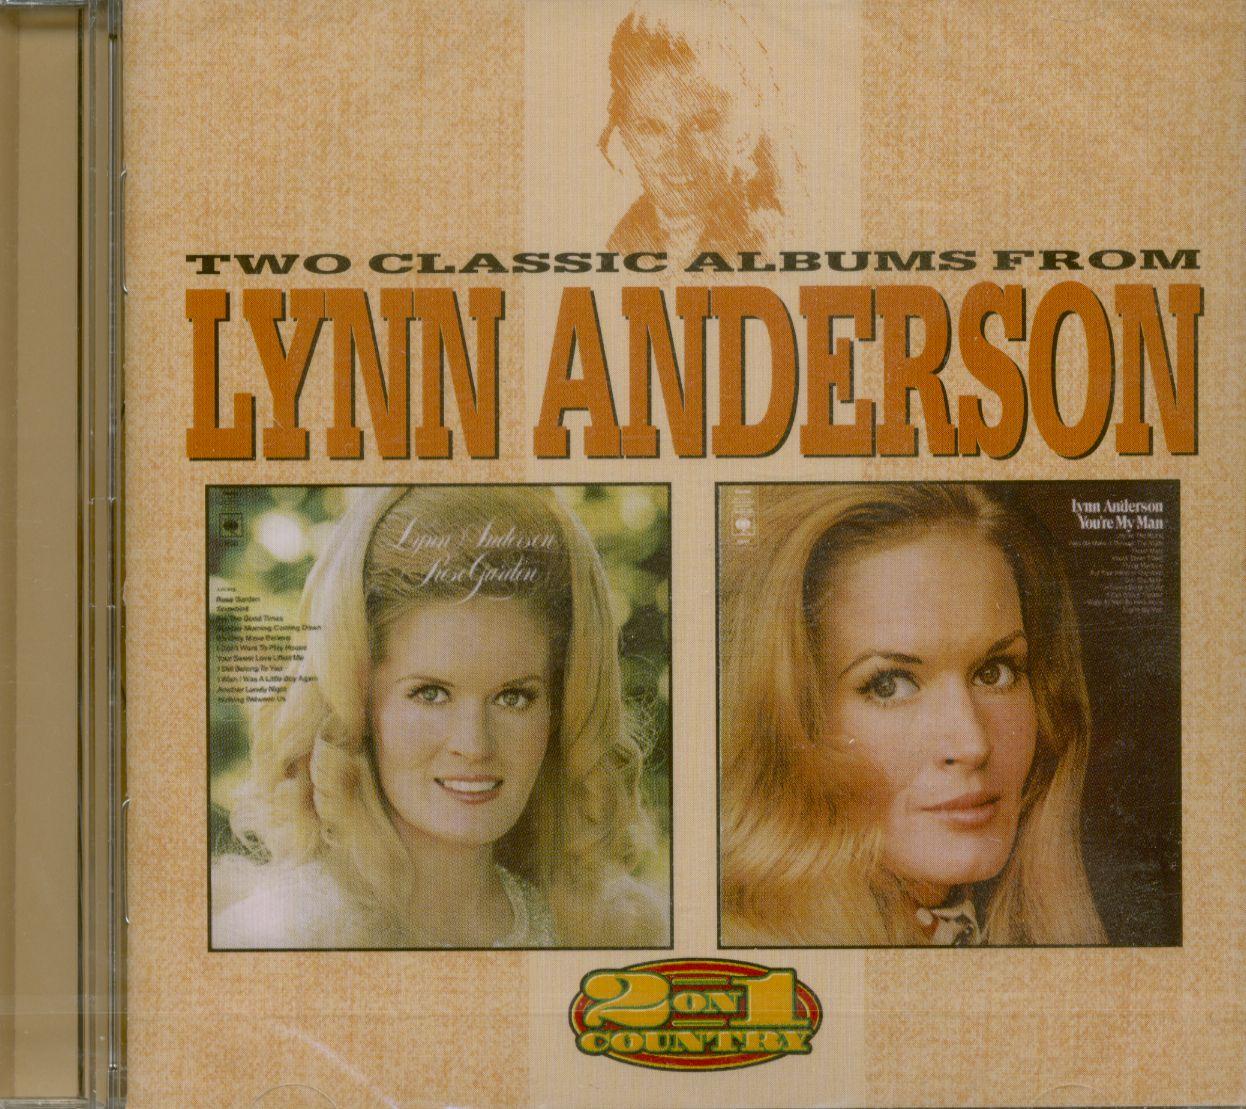 Lynn Anderson CD: Rose Garden - You\'re My Man (CD) - Bear Family Records